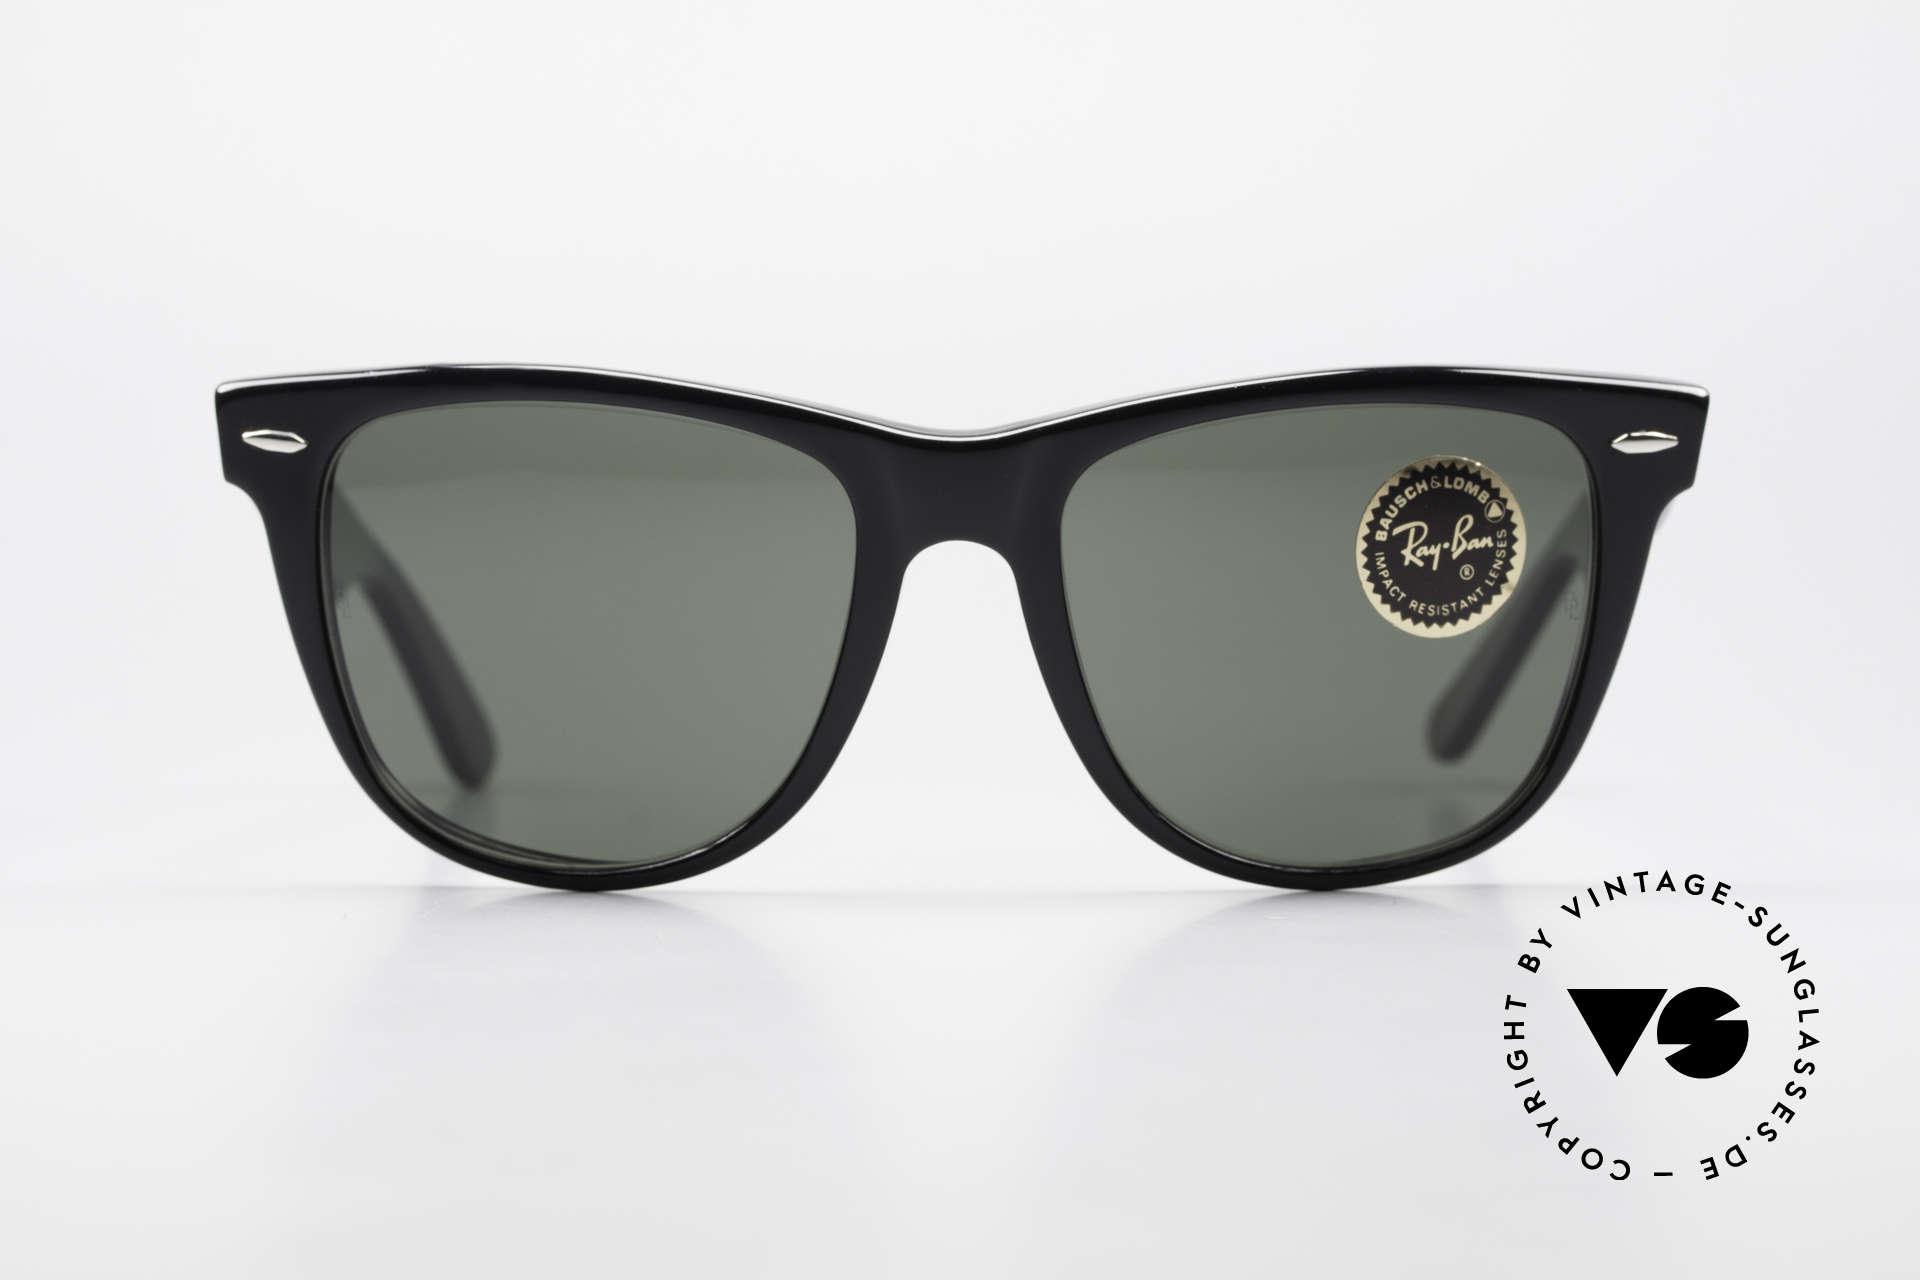 Ray Ban Wayfarer II JFK USA Vintage Sunglasses, worn by John F. Kennedy in the 60's - a legend!, Made for Men